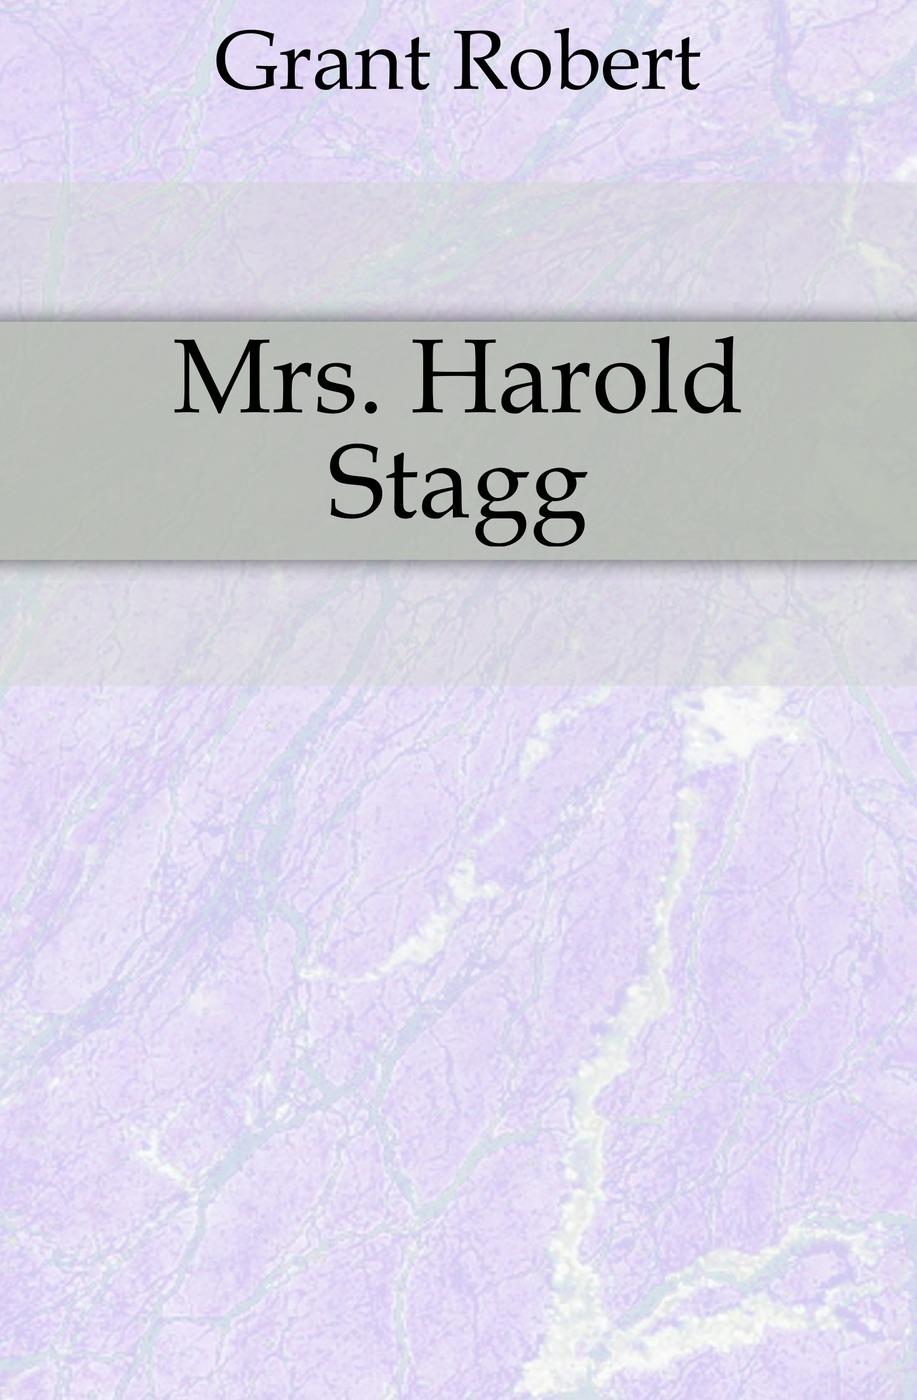 цена на Grant Robert Mrs. Harold Stagg